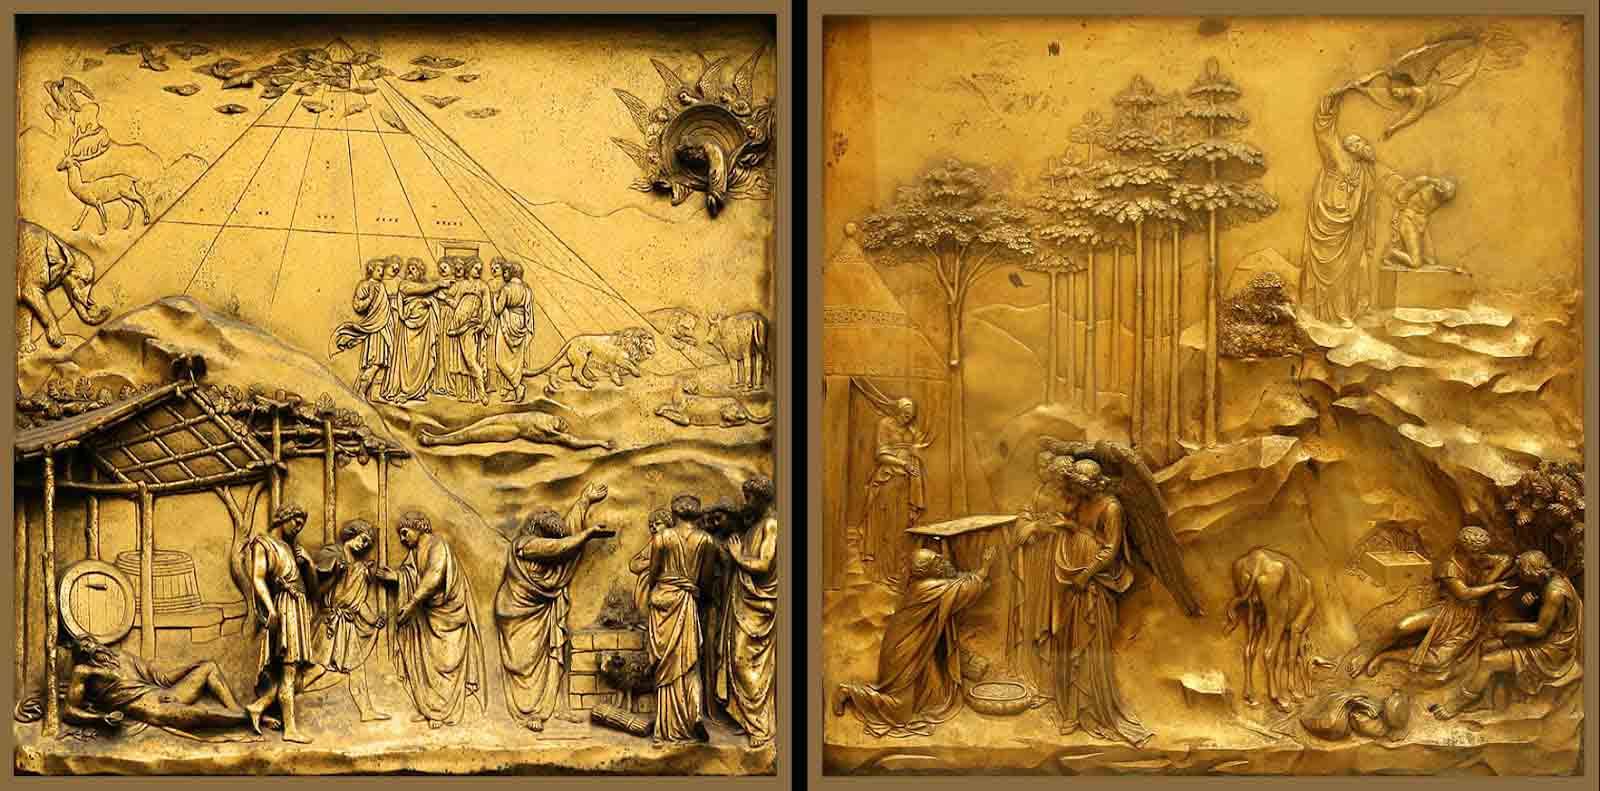 910 3 Ghiberti-Pta Paraiso-Noe,Abraham-Bapt Florencia - copia (1)